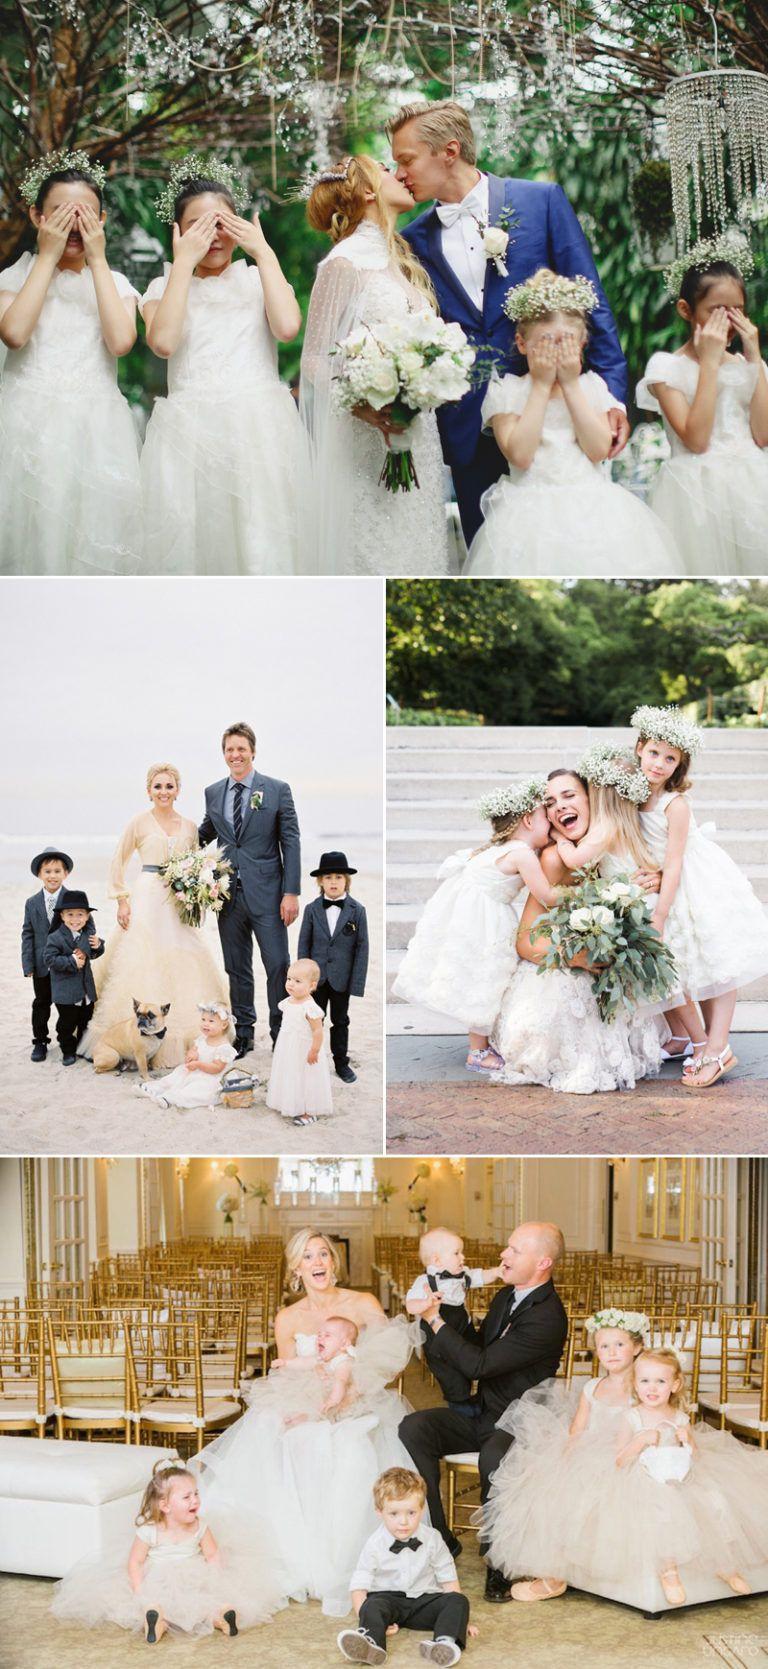 50 Must See Creative Fun Wedding Day Group Photos